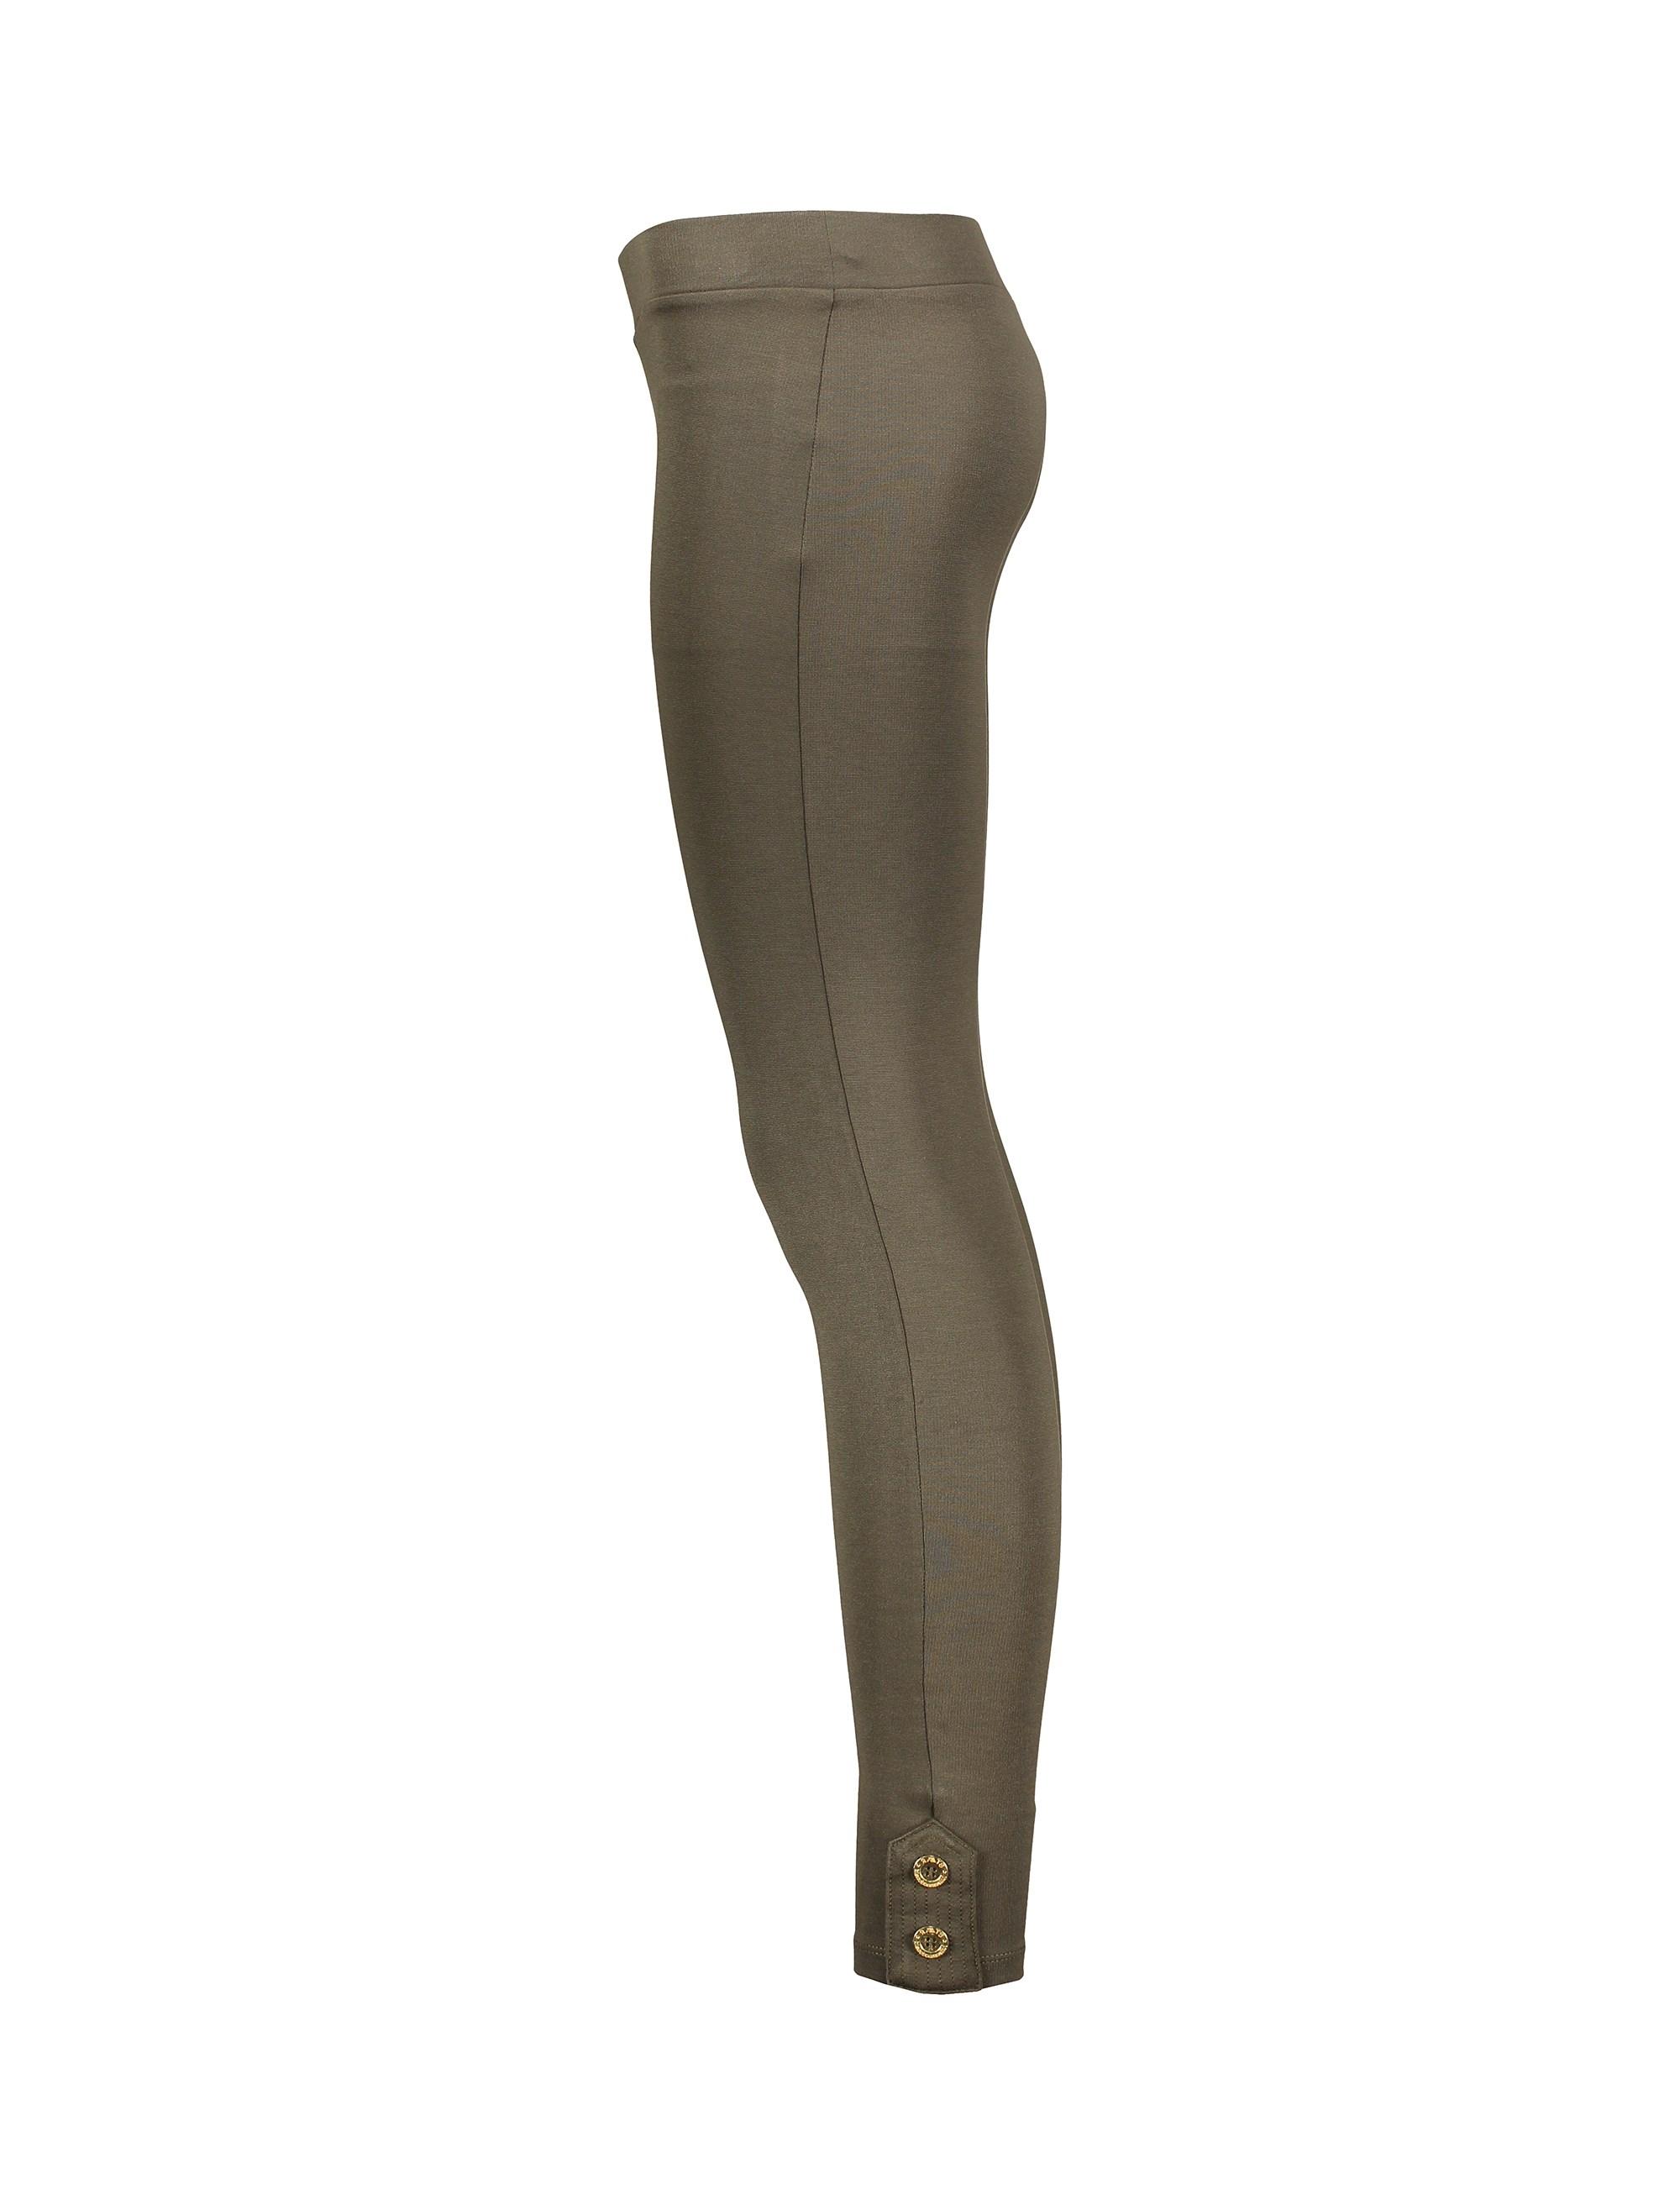 لگینگ ویسکوز بلند زنانه - استار بای جولین مک دونالد - زيتوني - 3